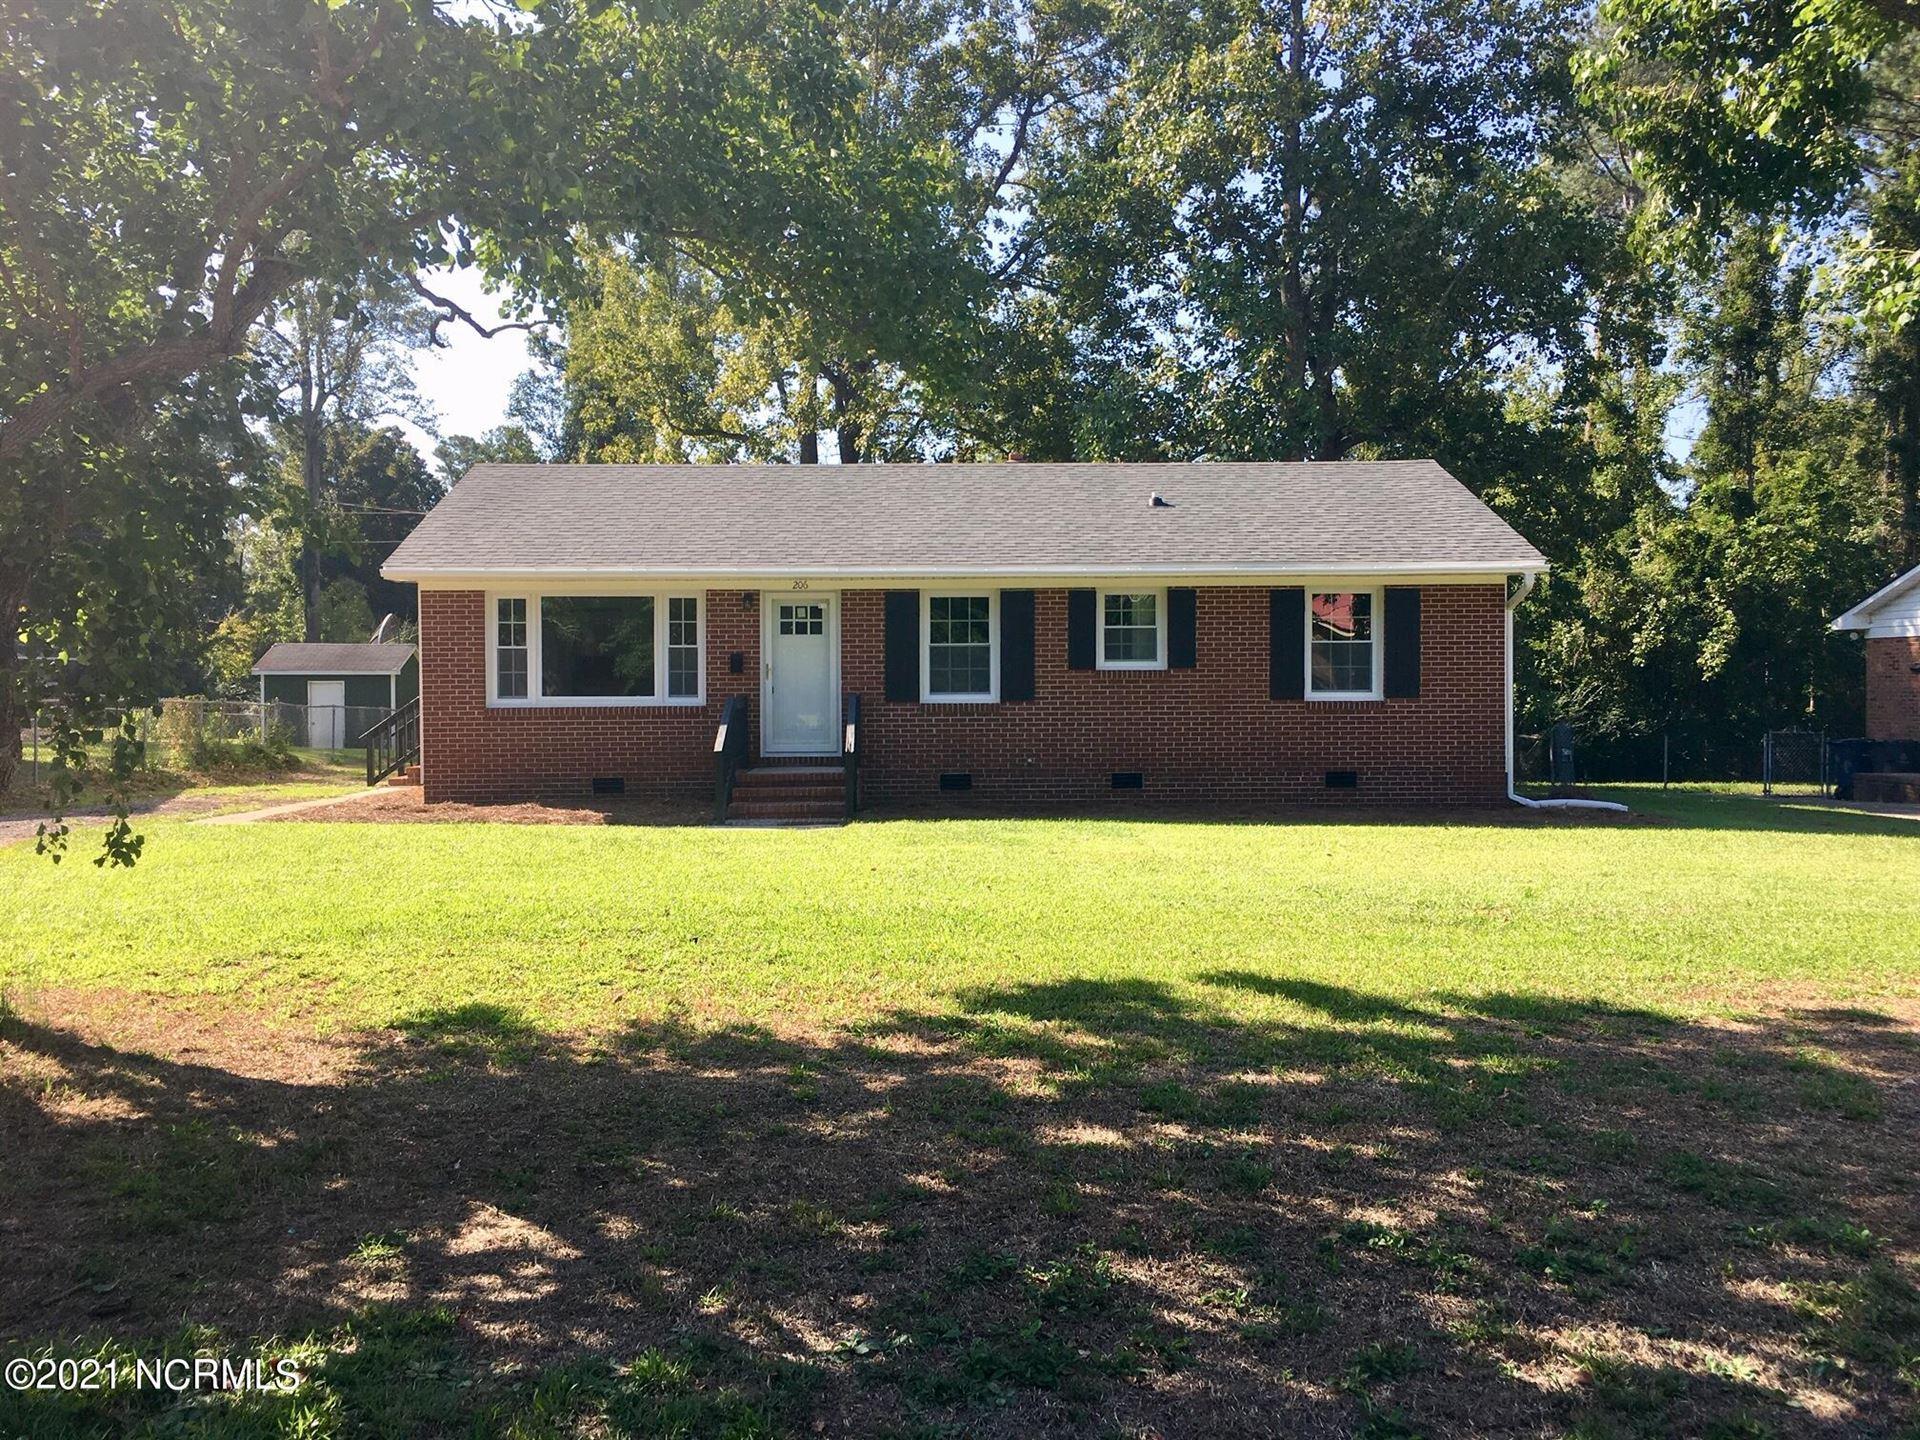 Photo of 206 Puller Drive, Jacksonville, NC 28540 (MLS # 100294286)